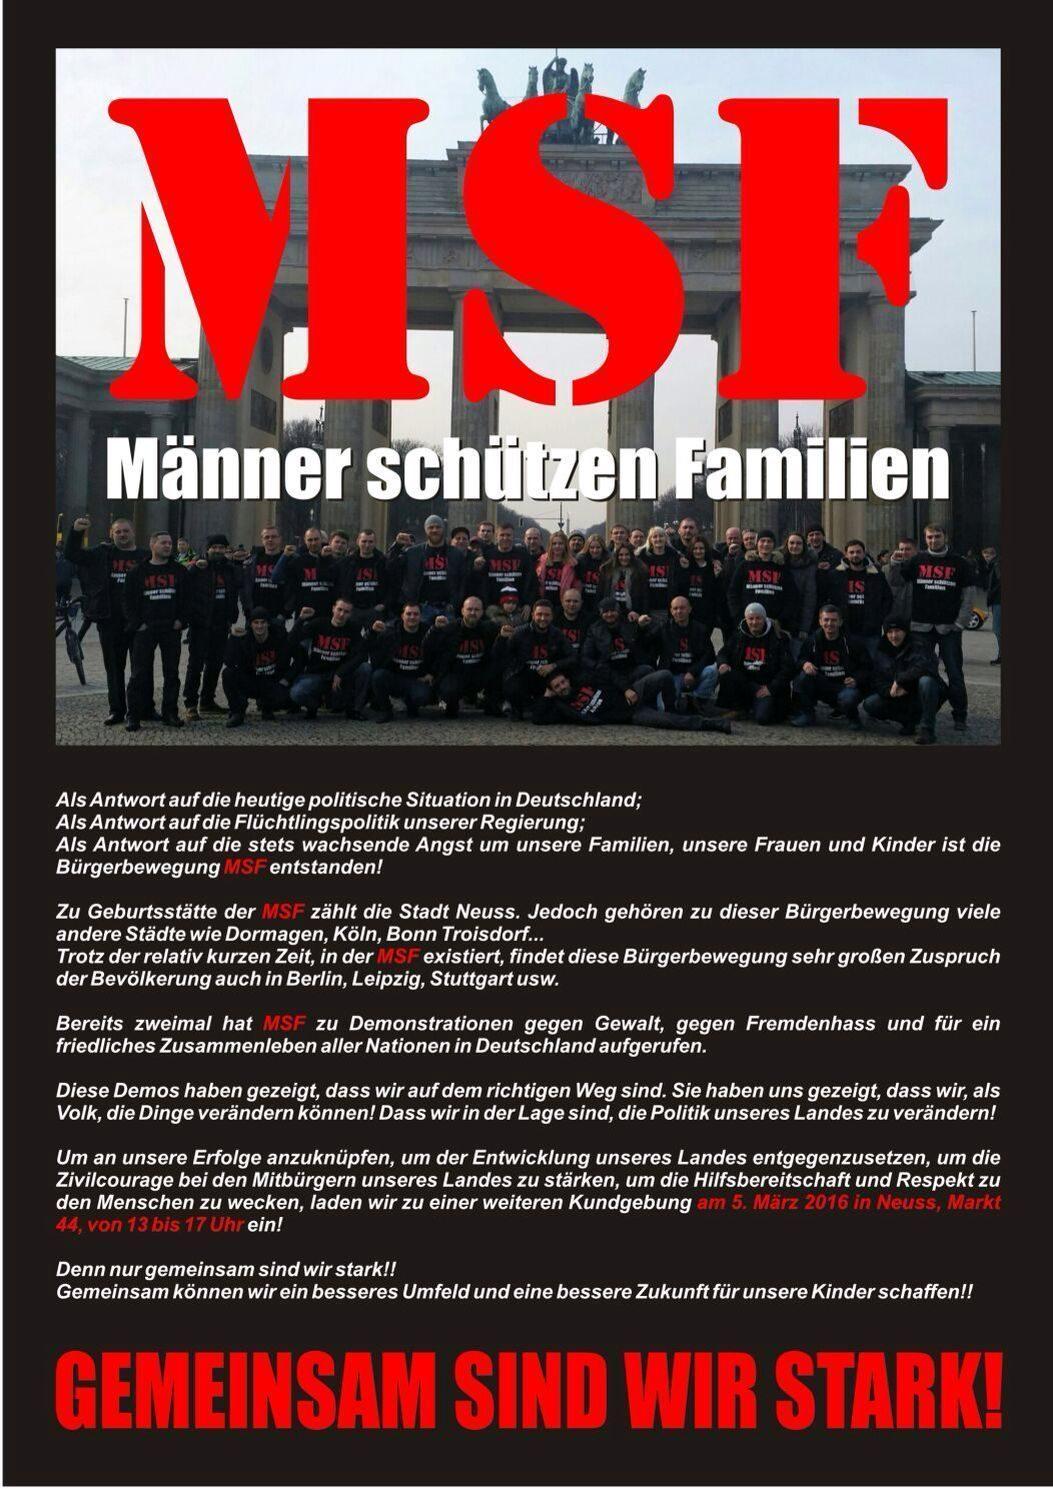 MSF - Мужчины защищают семьи